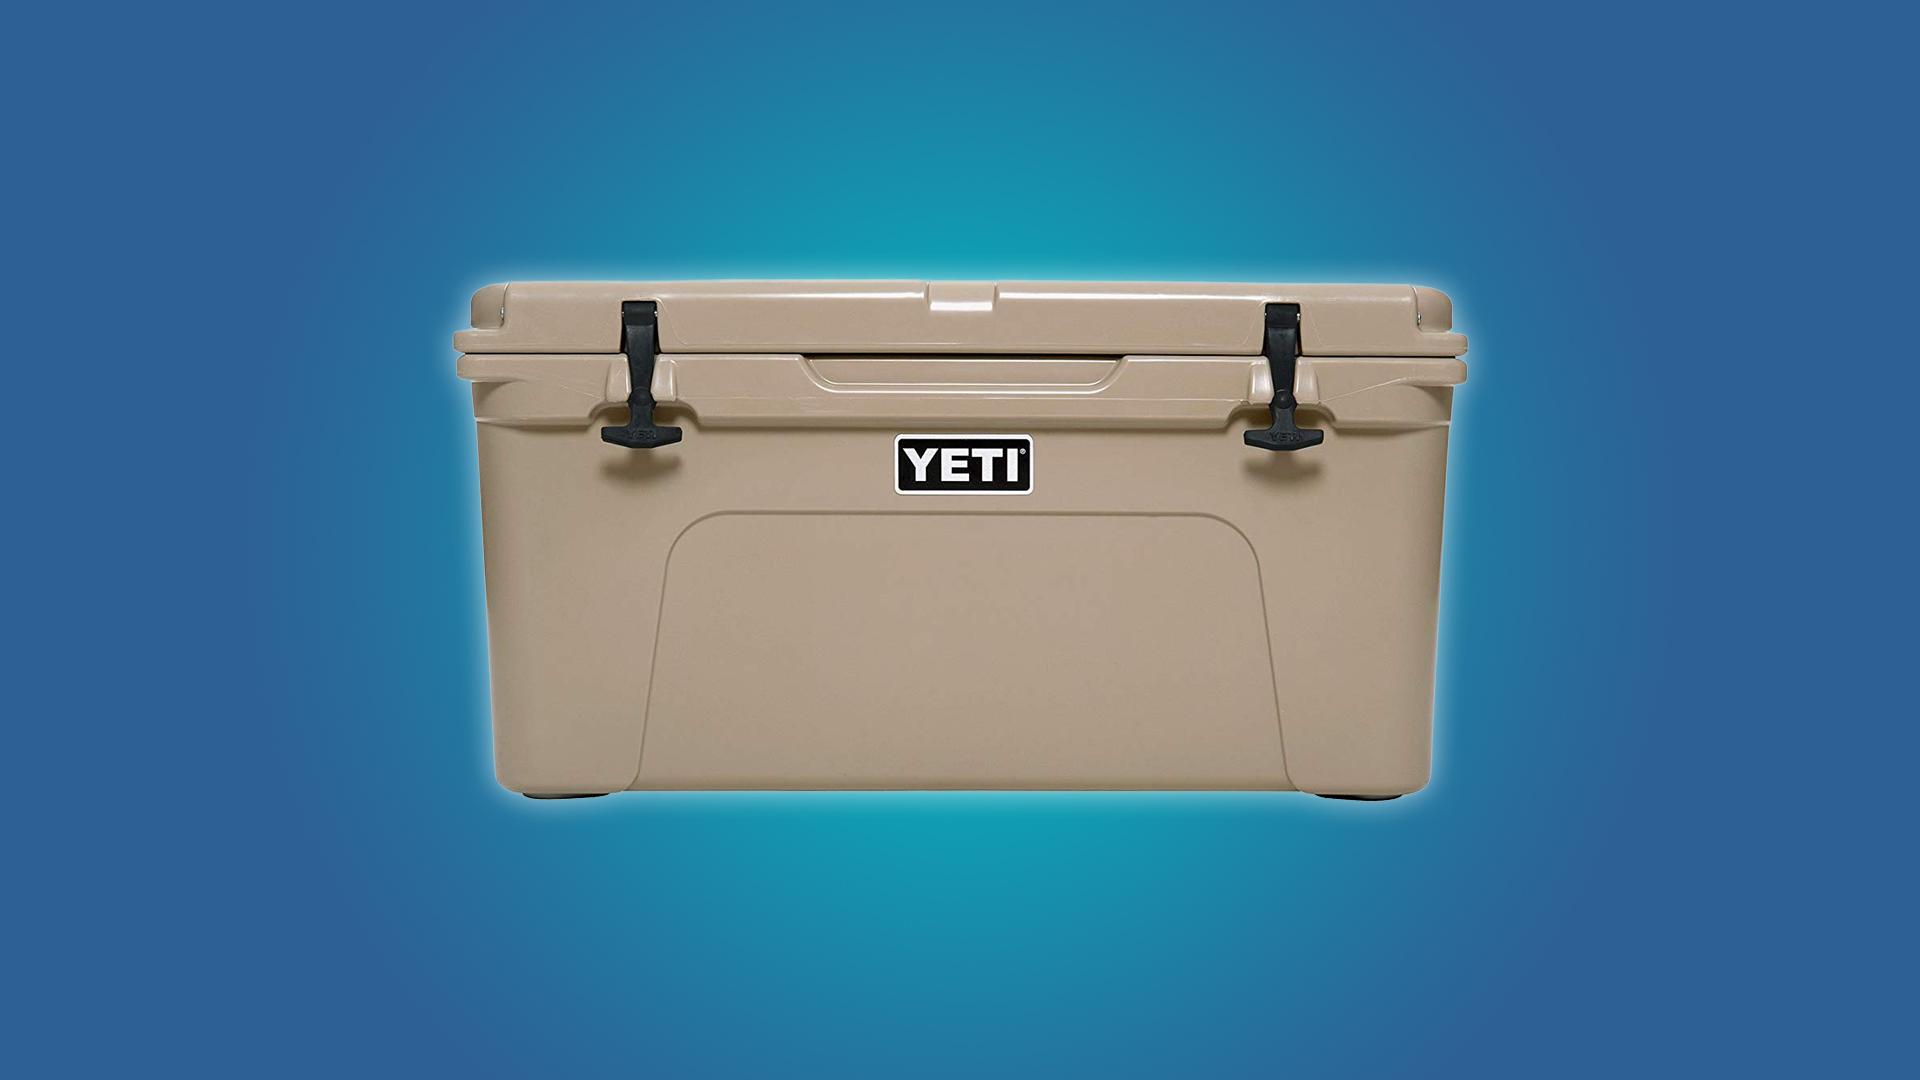 The YETI Tundra 65 57qt Cooler